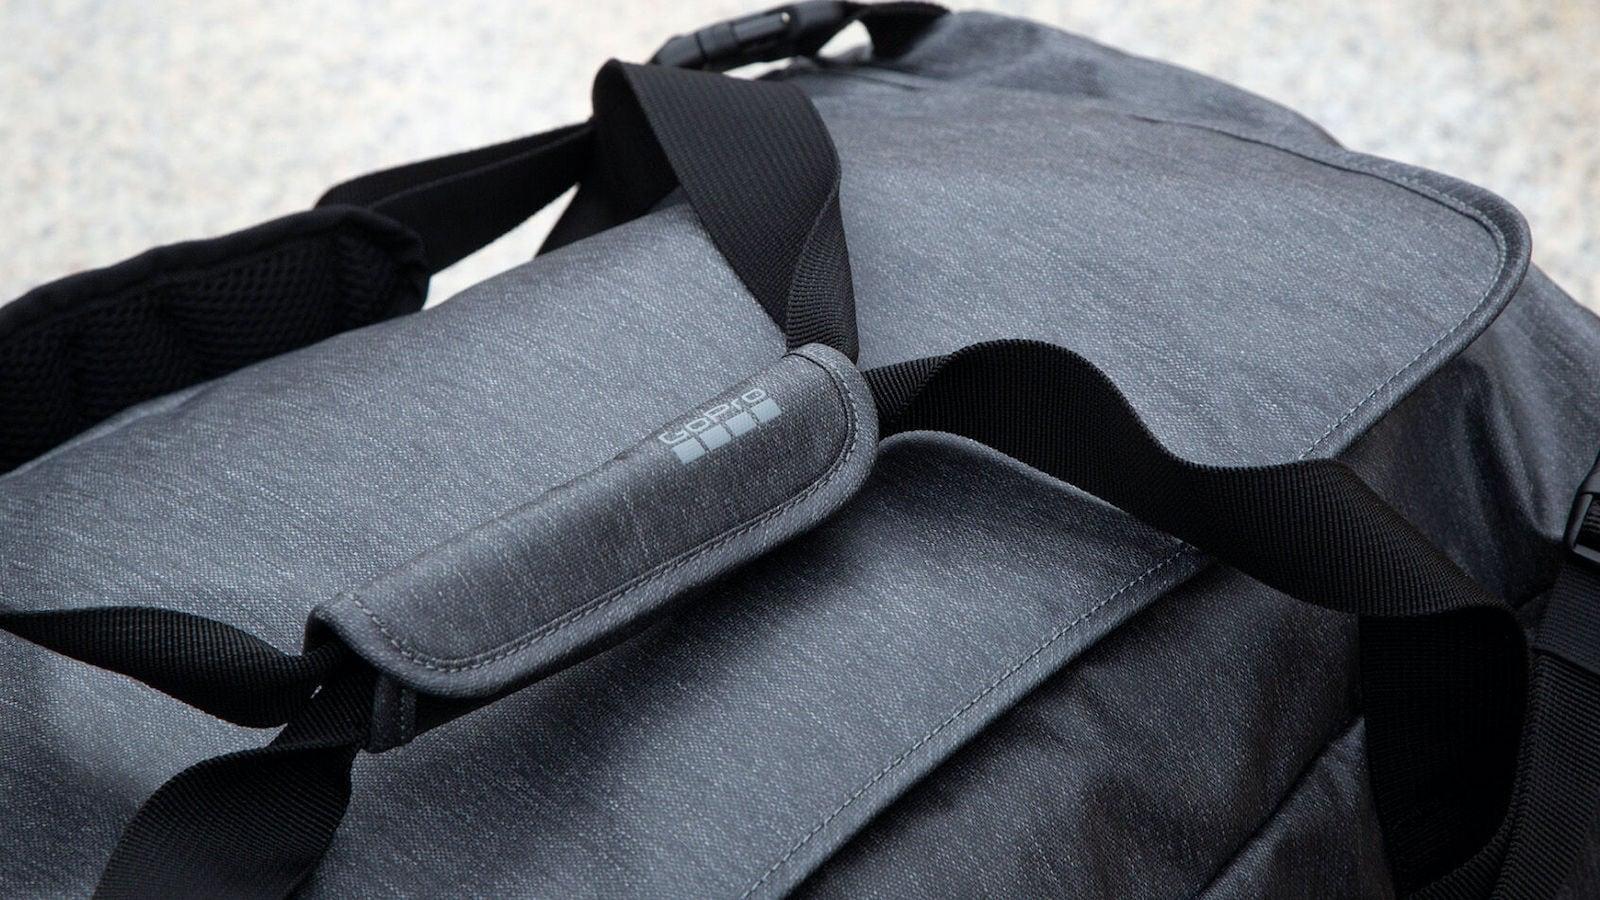 GoPro Mission Backpack Duffel Bag 2-in-1 Backpack